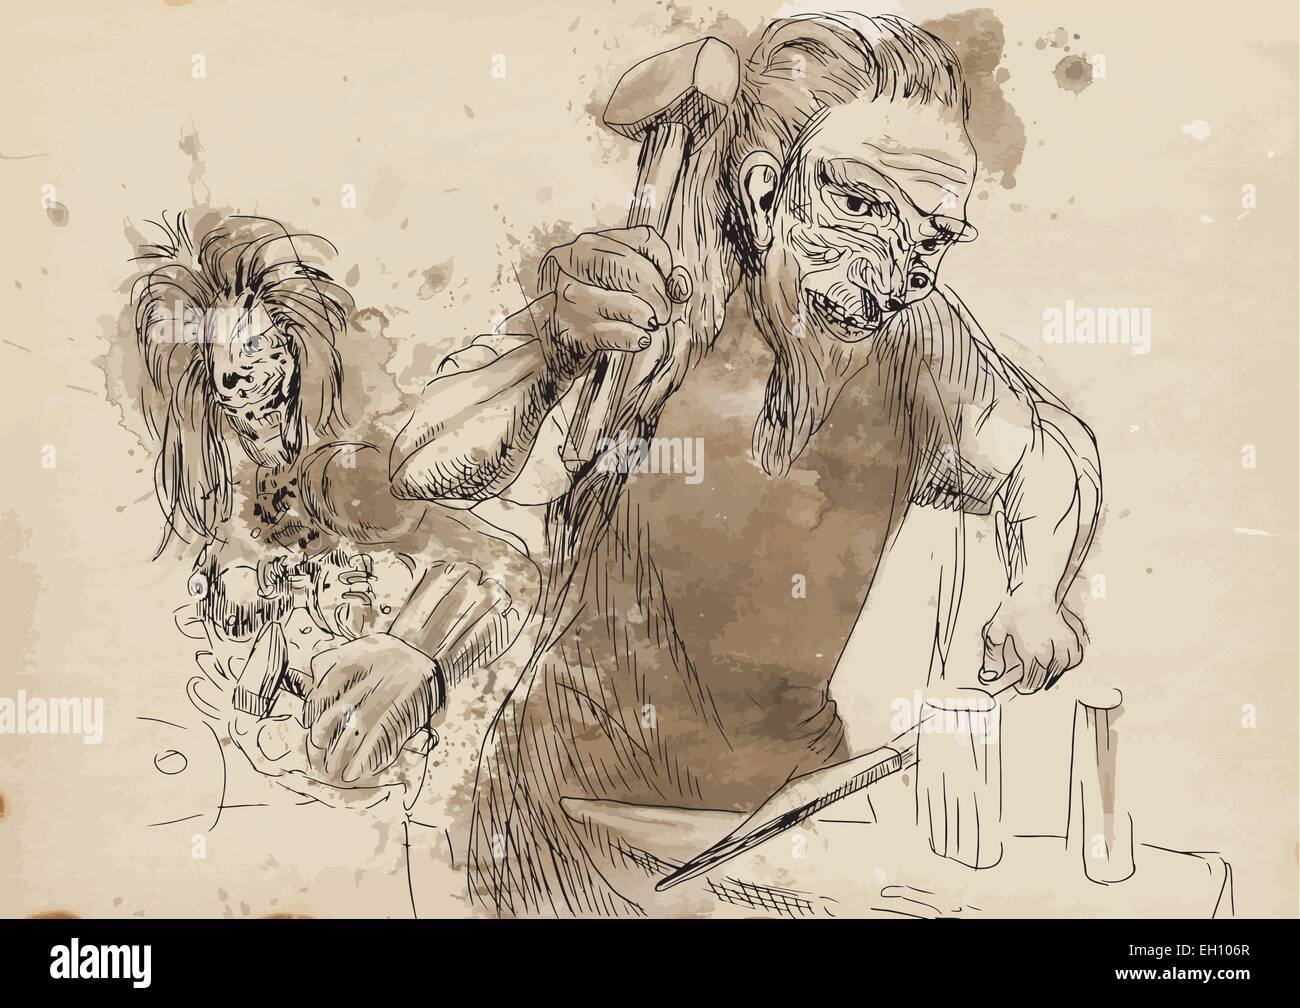 hephaestus is the greek god of blacksmiths craftsmen artisans